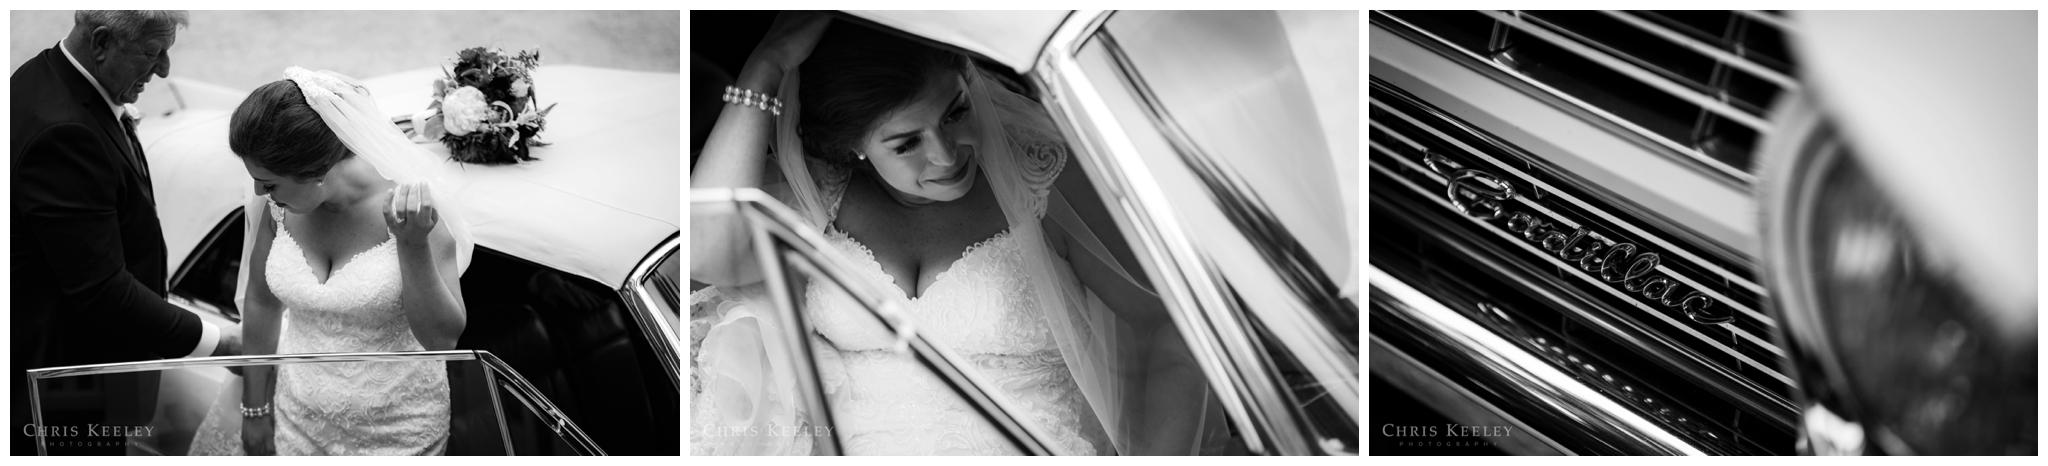 burrows-new-hampshire-wedding-photographer-chris-keeley-21.jpg